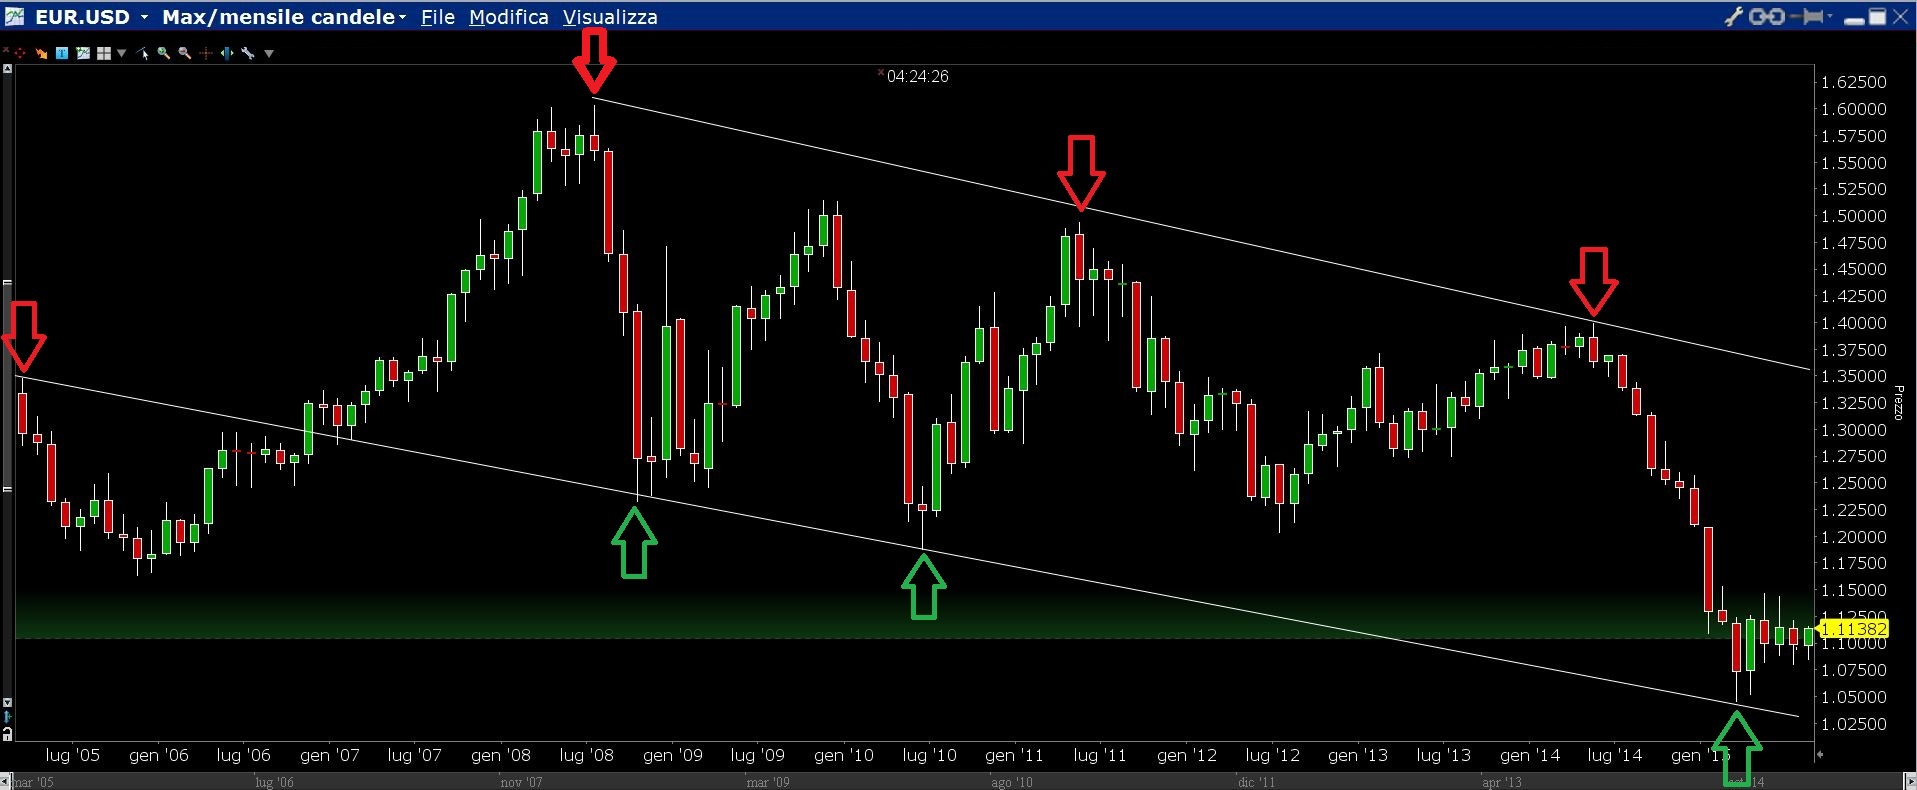 Forex trading journal blog